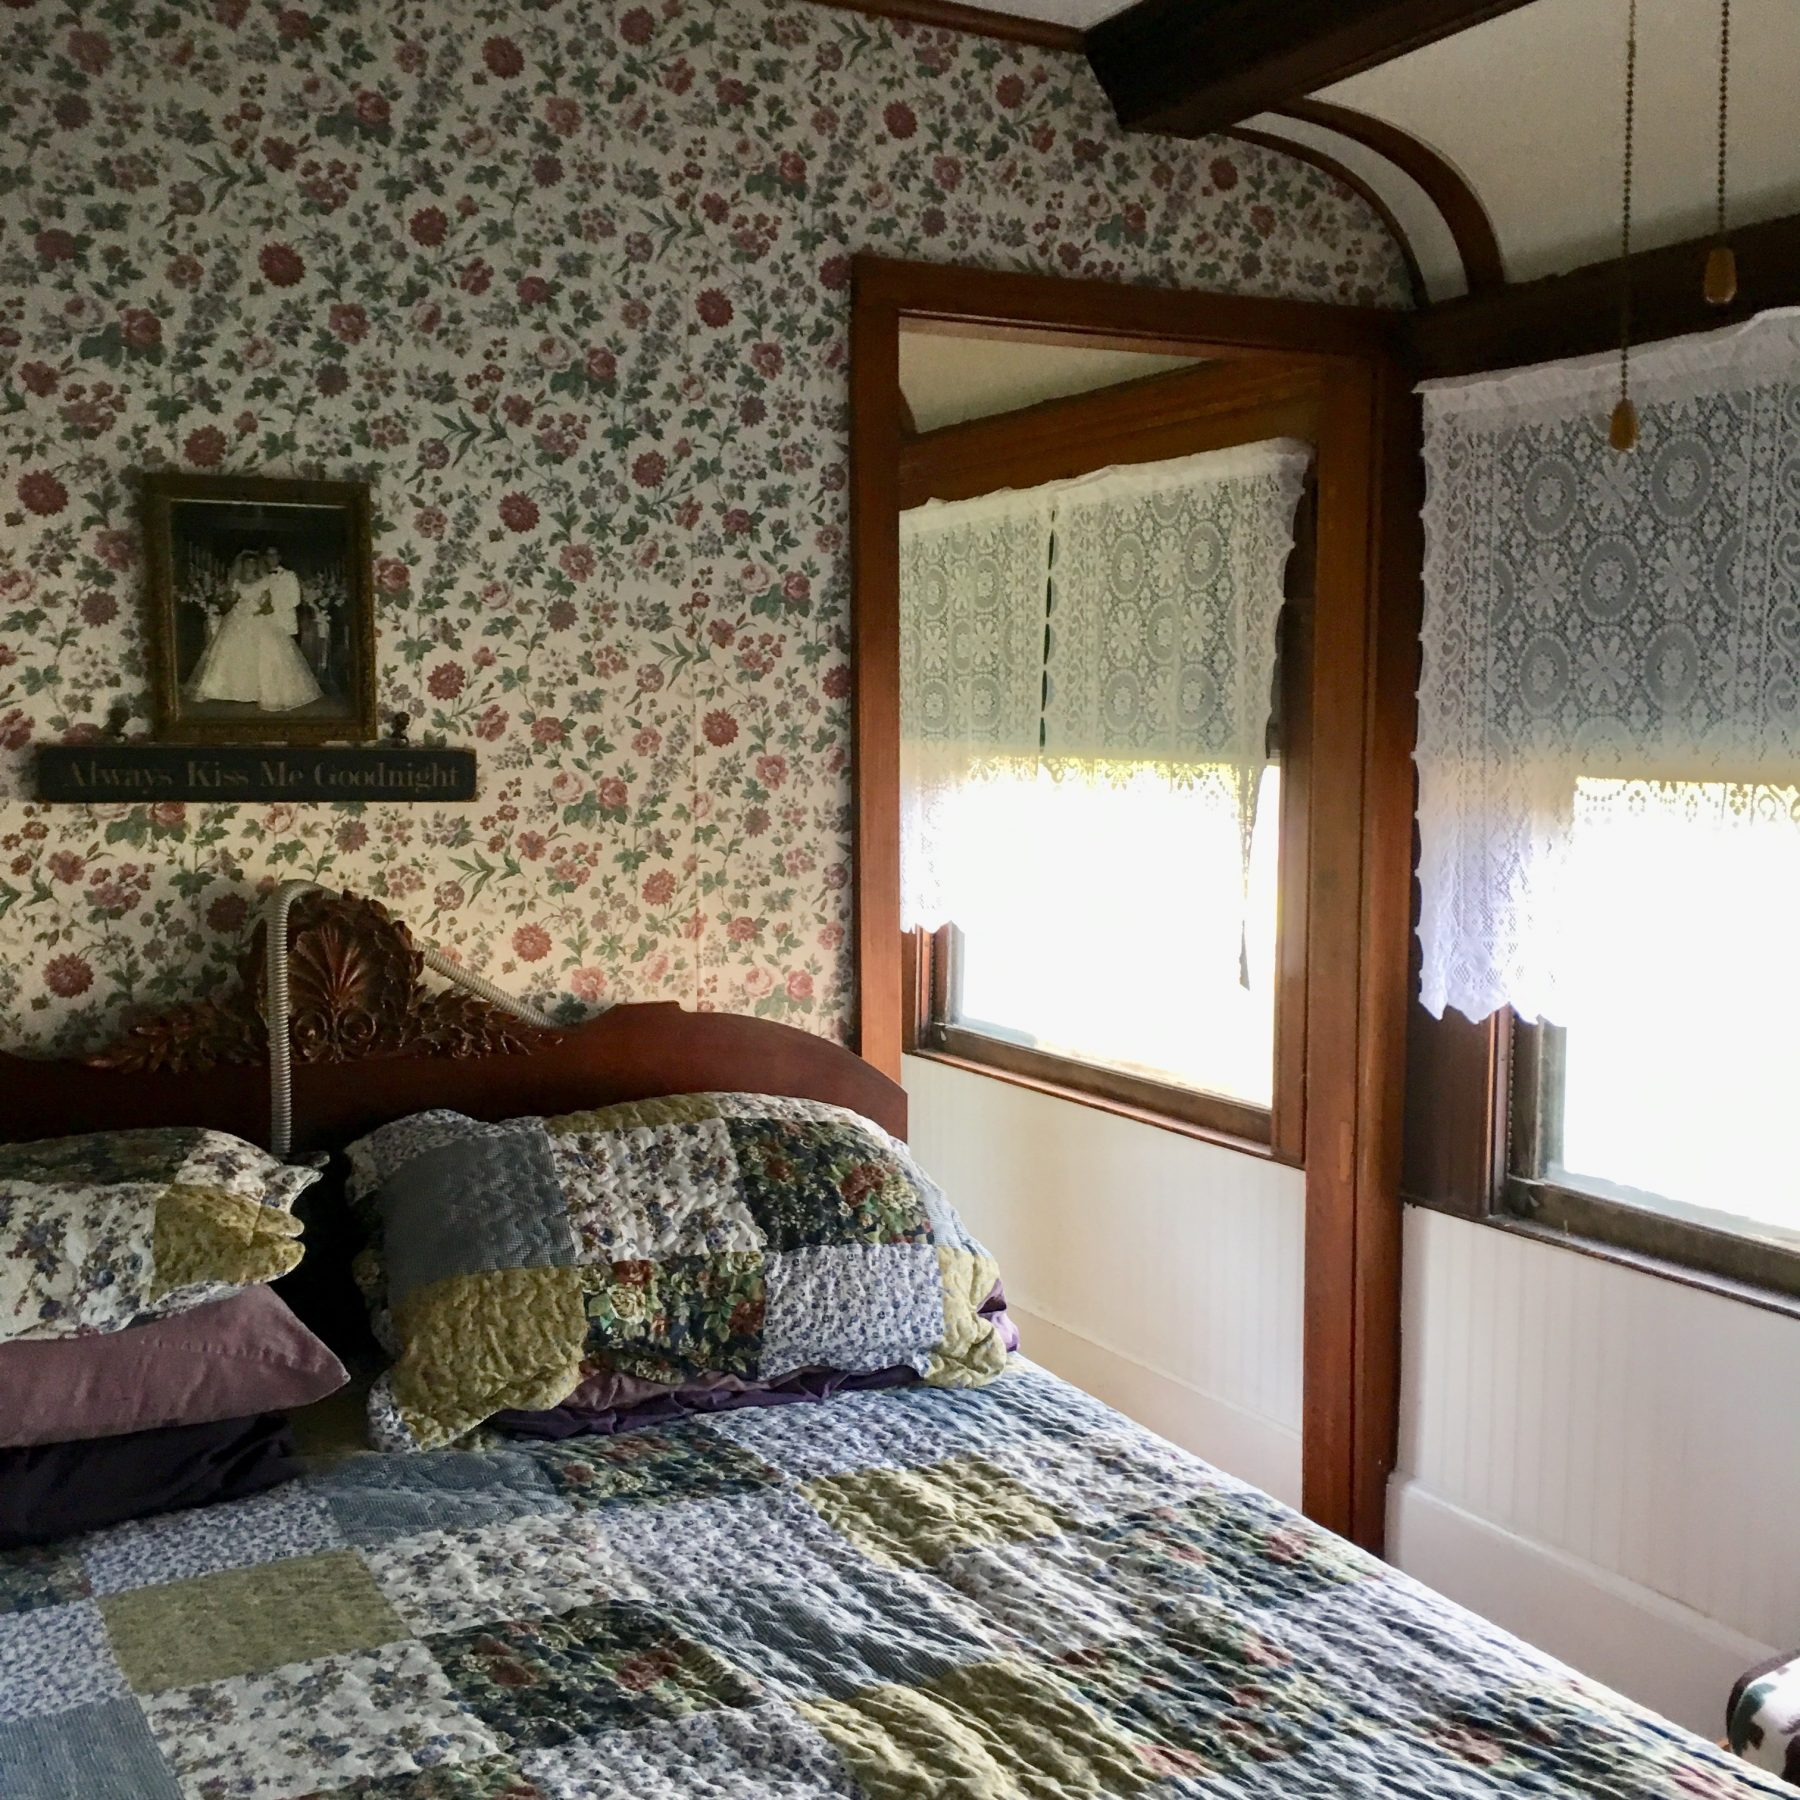 Maxson bedroom 2